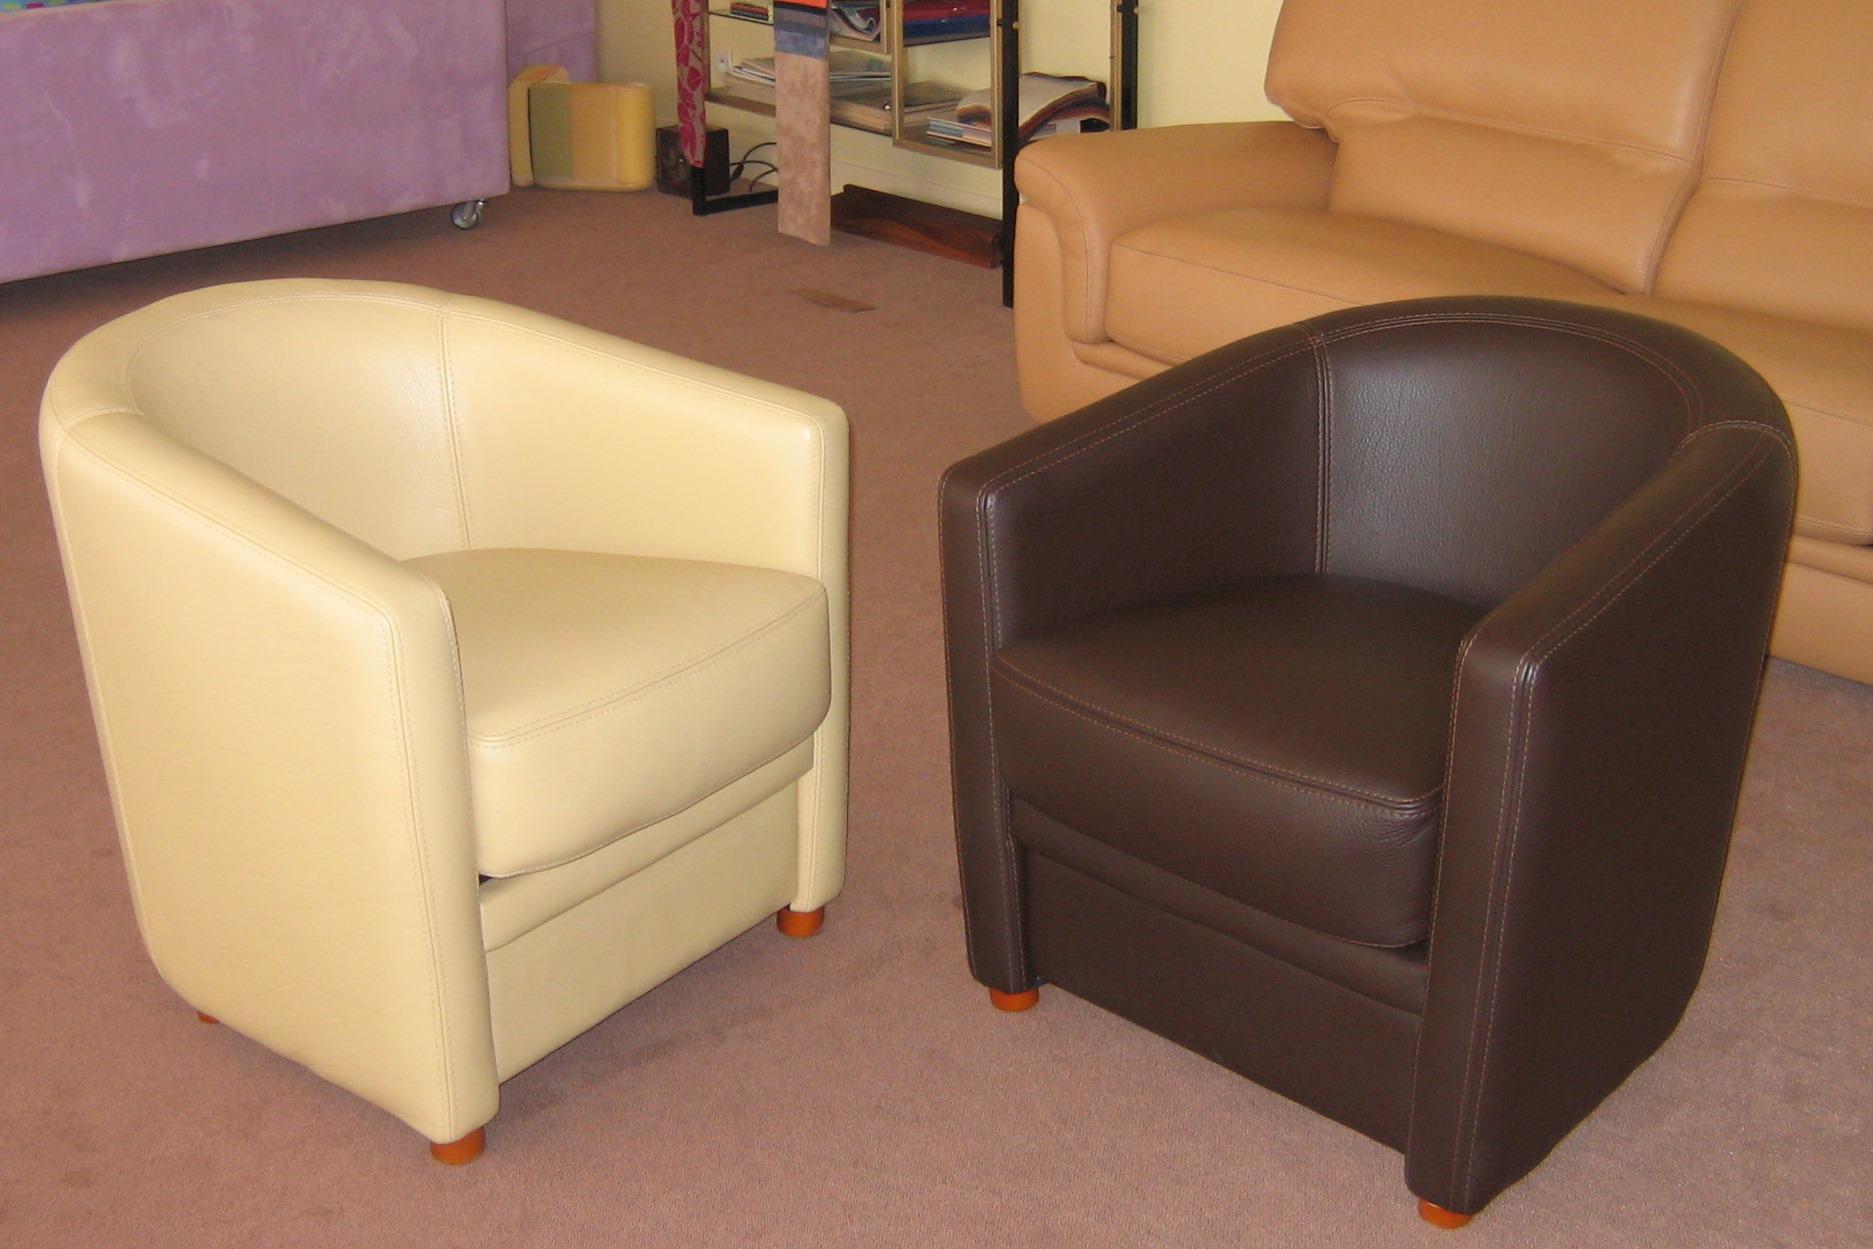 collection jandri l 39 album photo des collections jandri et swann page 17. Black Bedroom Furniture Sets. Home Design Ideas